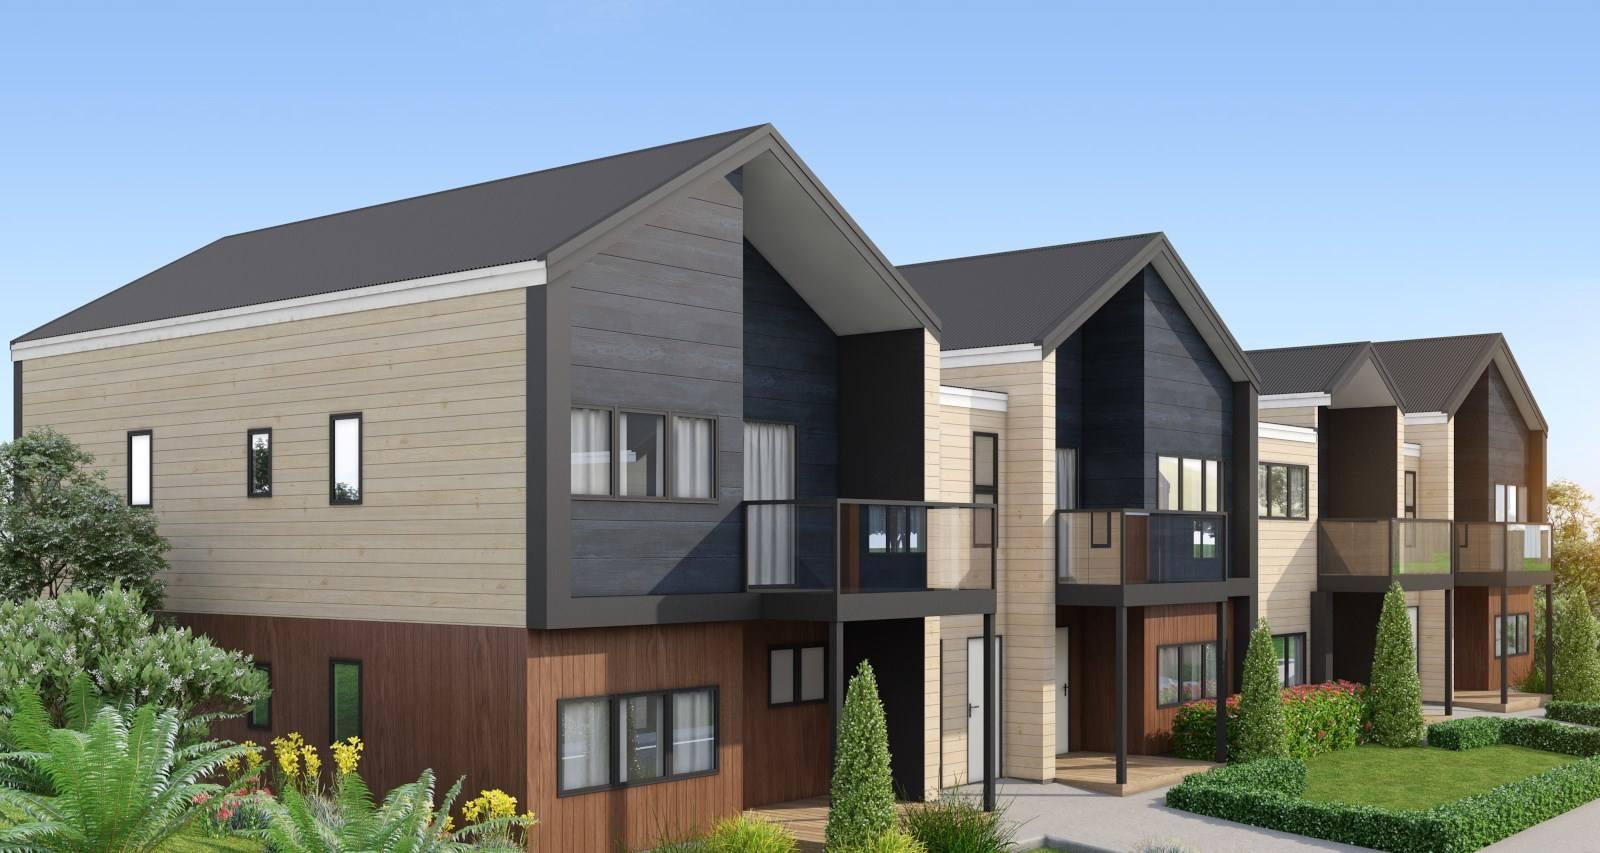 Henderson 2房 创新智能城市屋项目 出类拔萃的精品 繁华商圈配套 震撼发售! KIWI BUILT WITH NO RESTRICTIONS